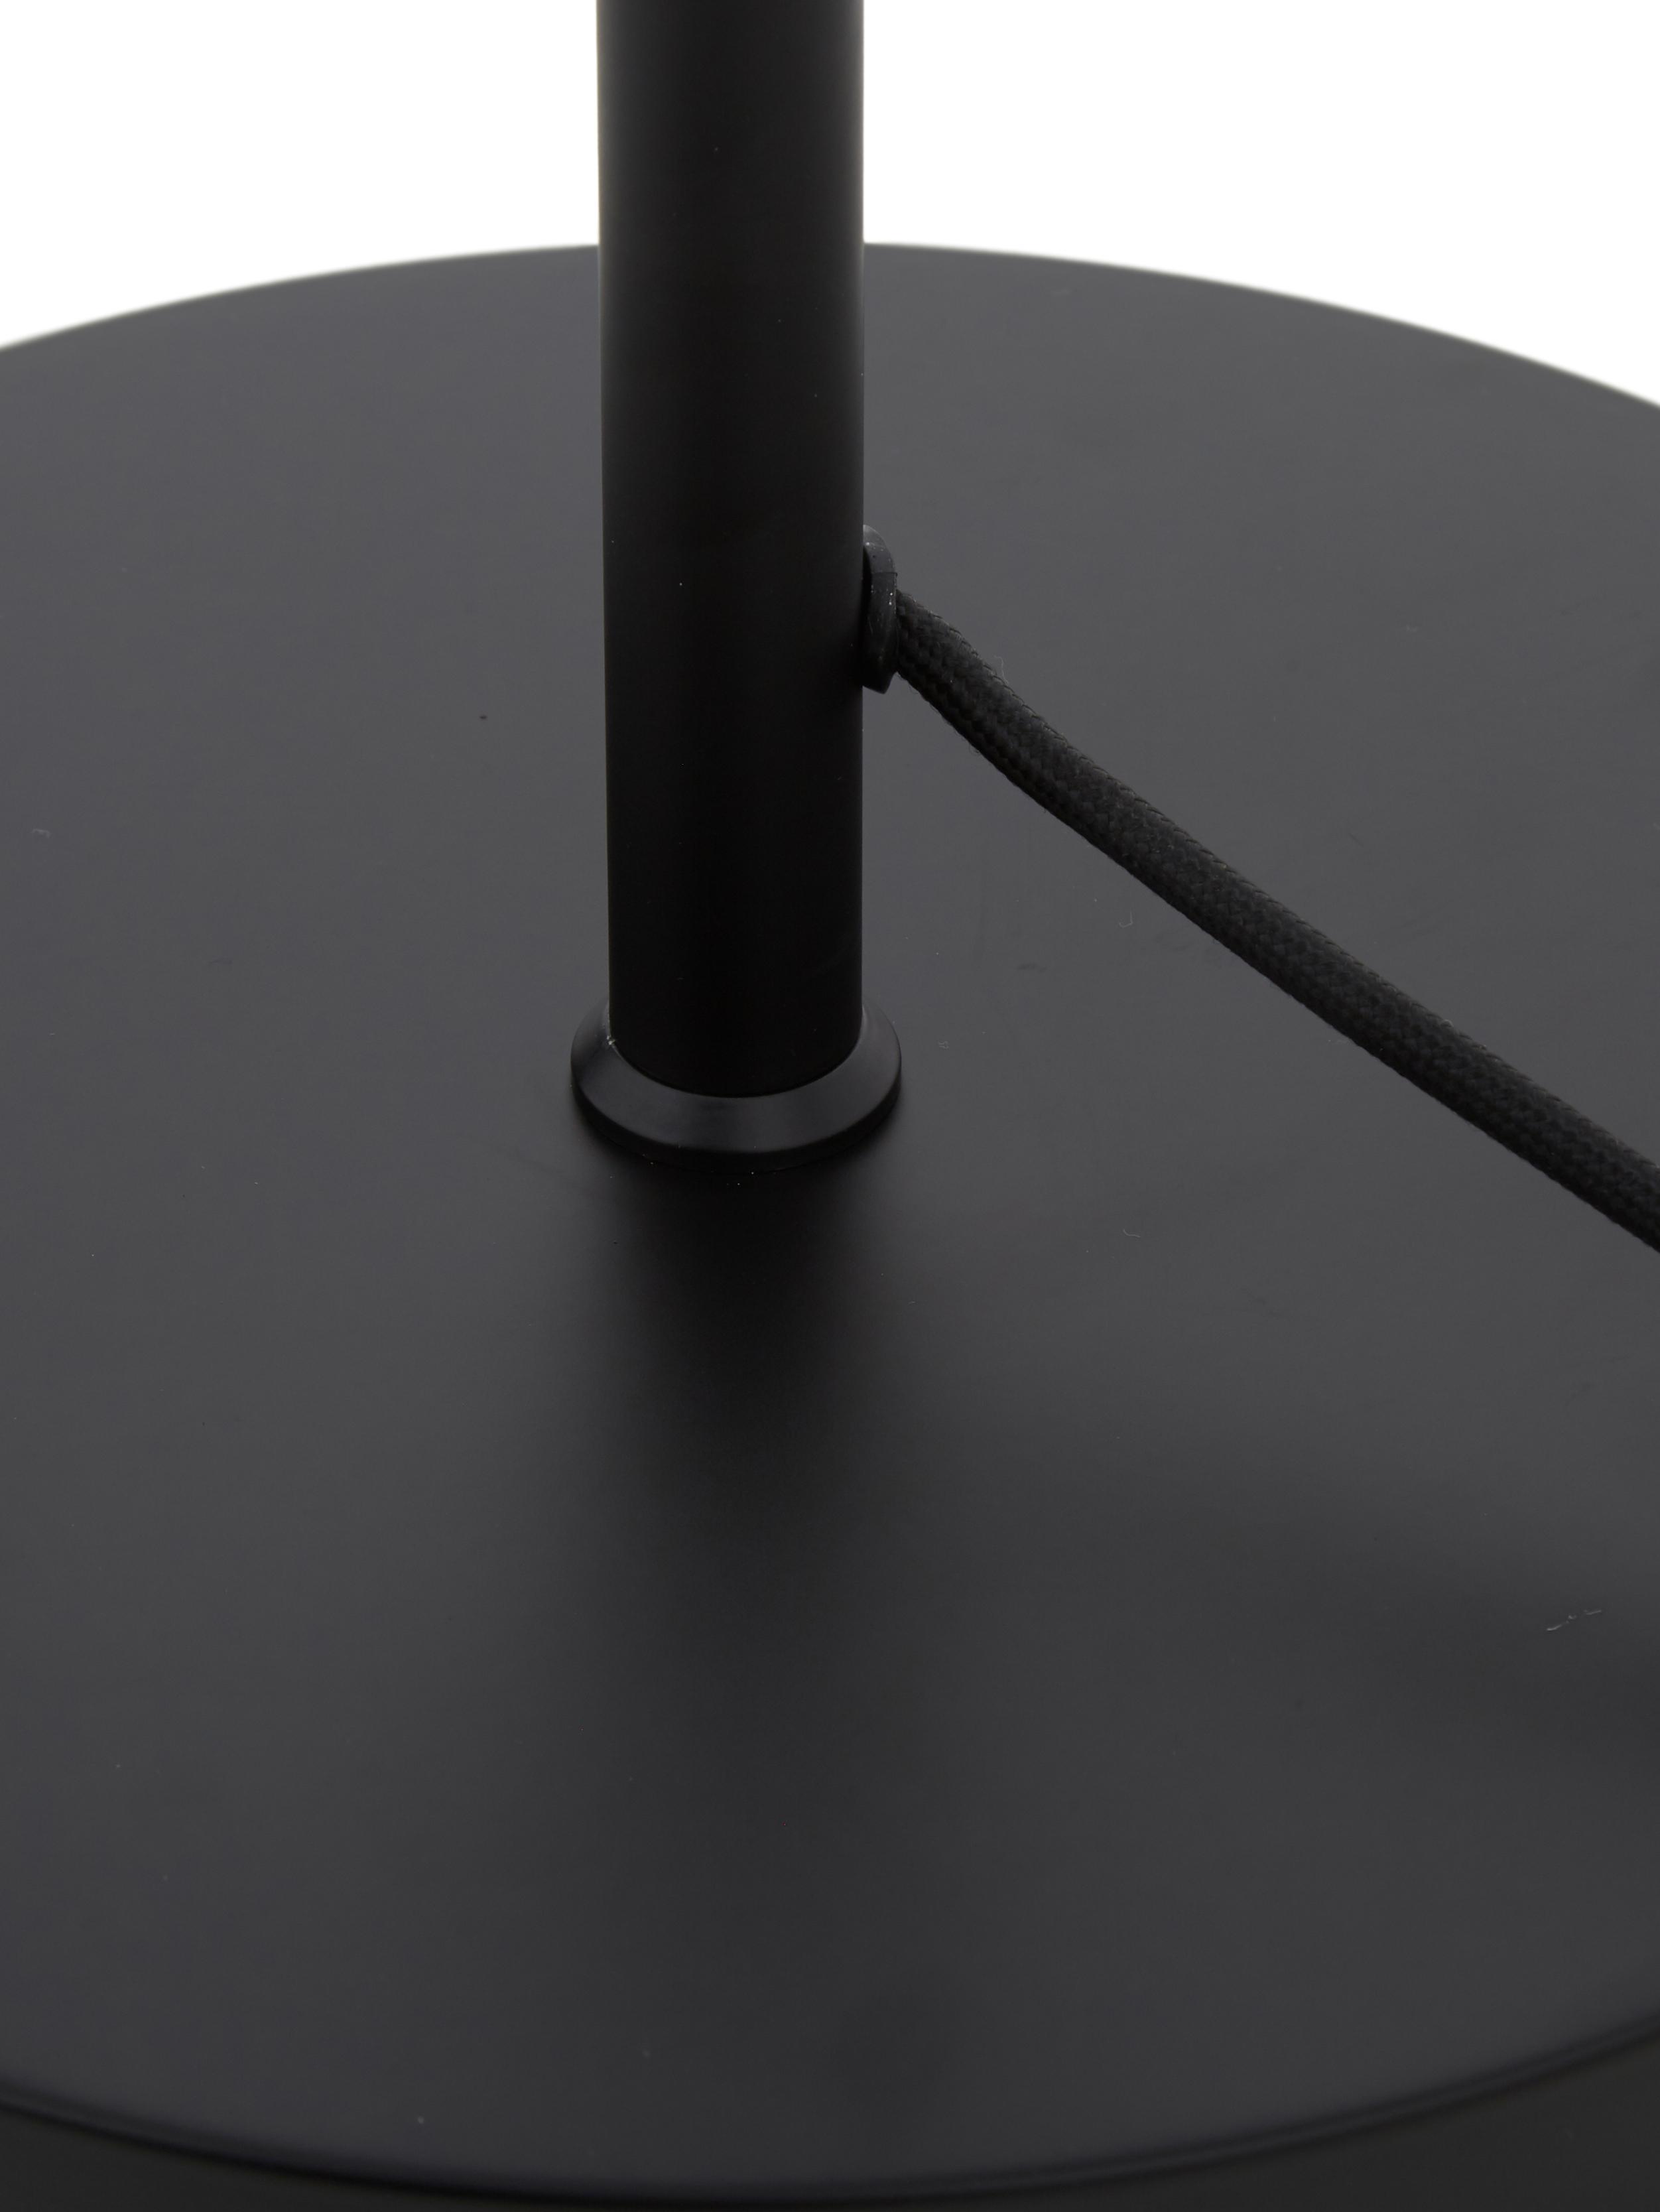 Stehlampe Matilda, Lampenschirm: Metall, pulverbeschichtet, Lampenfuß: Metall, pulverbeschichtet, Schwarz, Ø 40 x H 164 cm